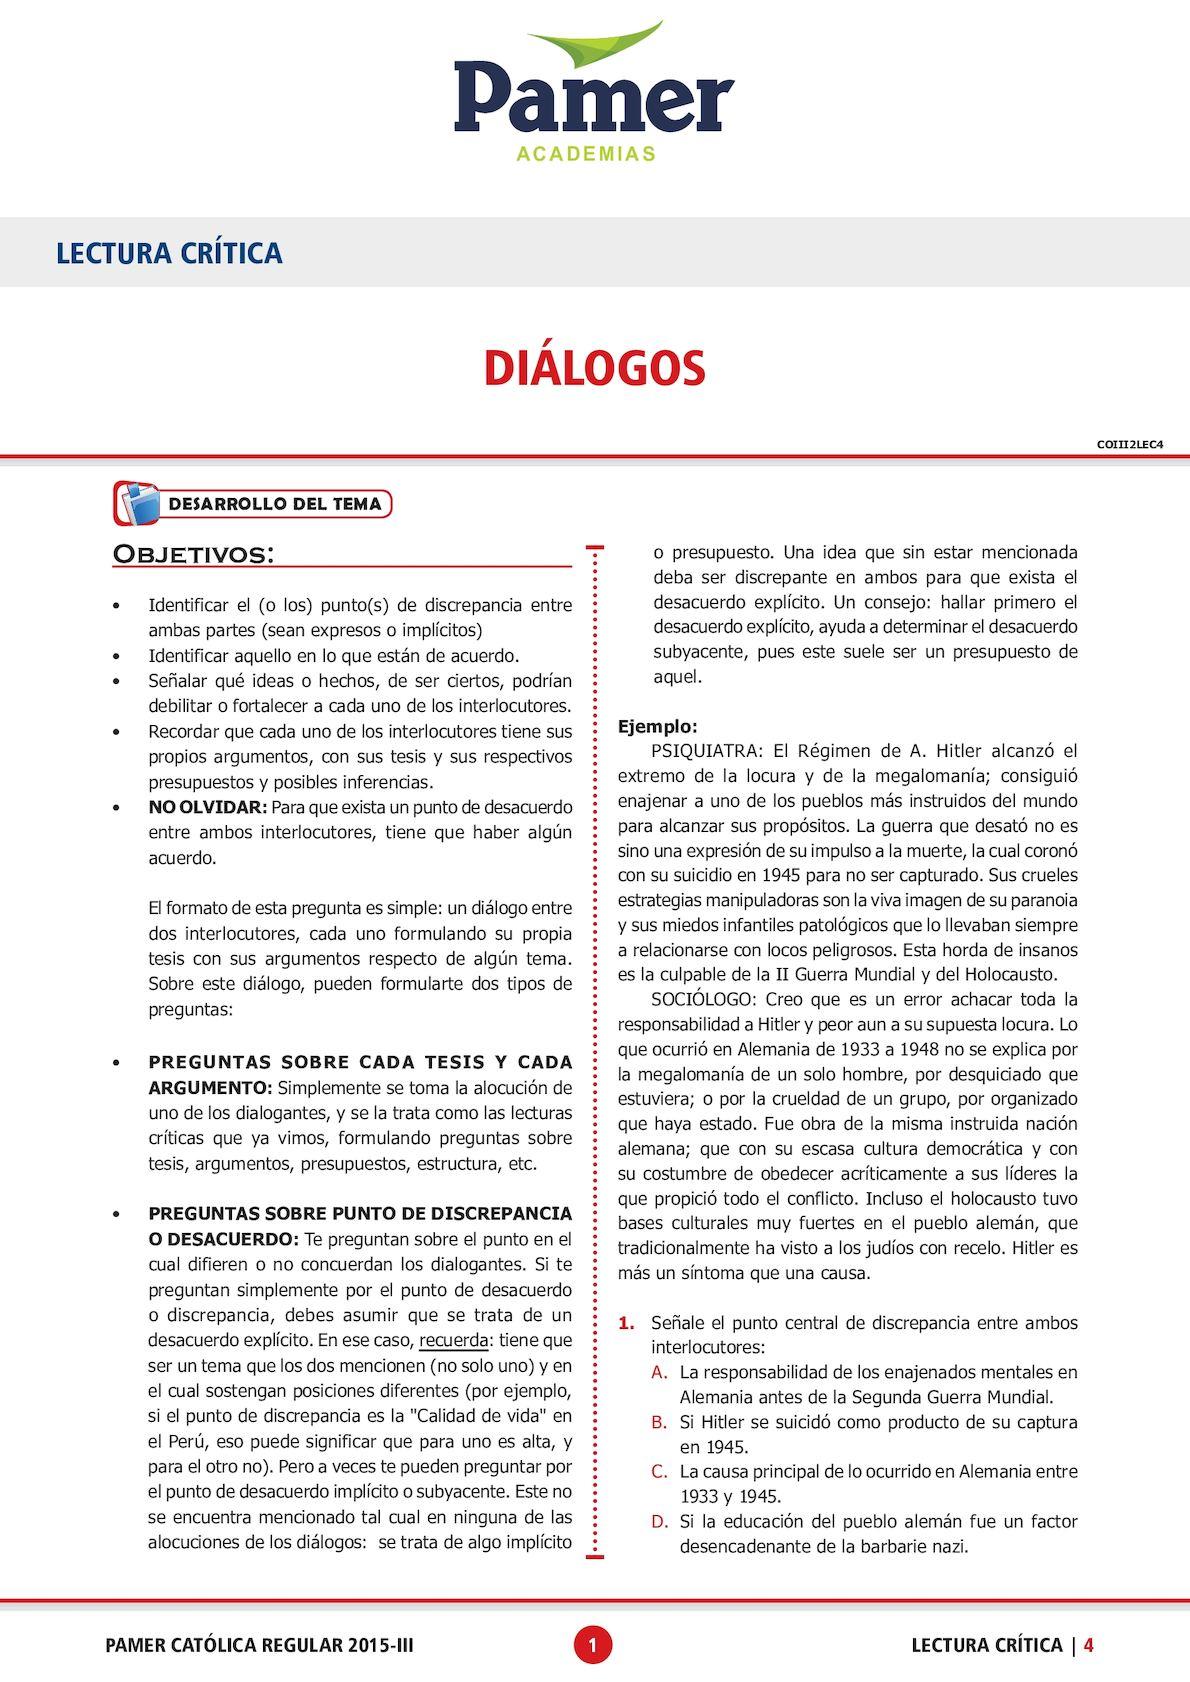 Tema 4 (Diálogos I)